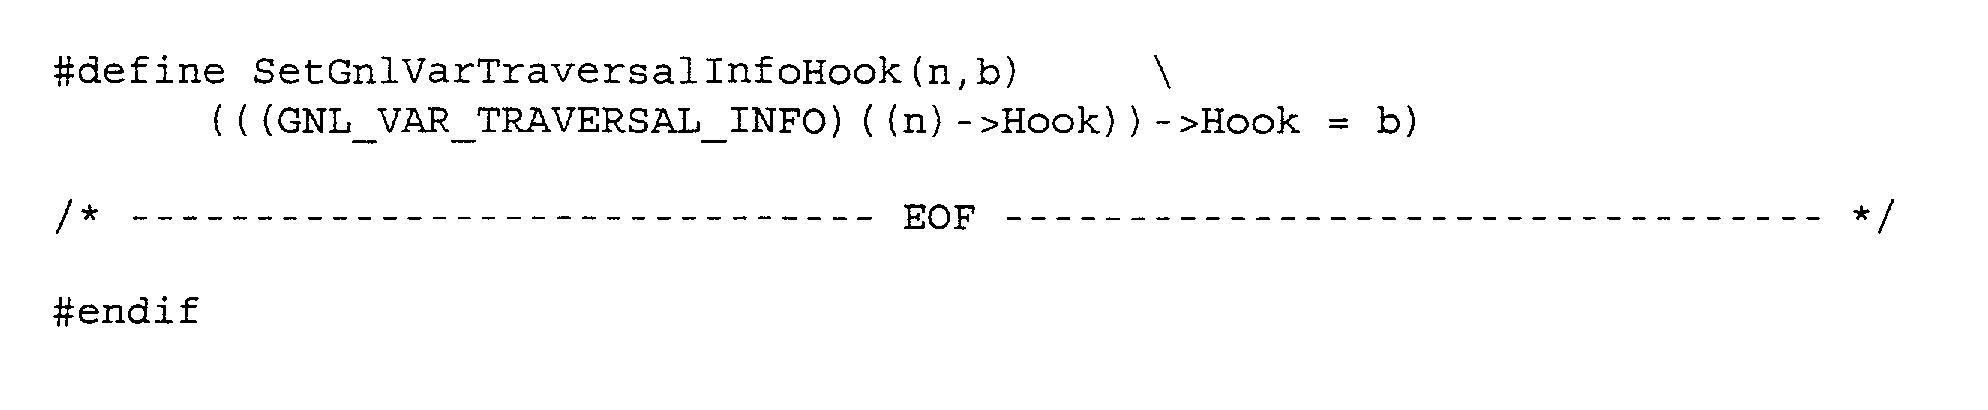 Figure US20020157063A1-20021024-P00950